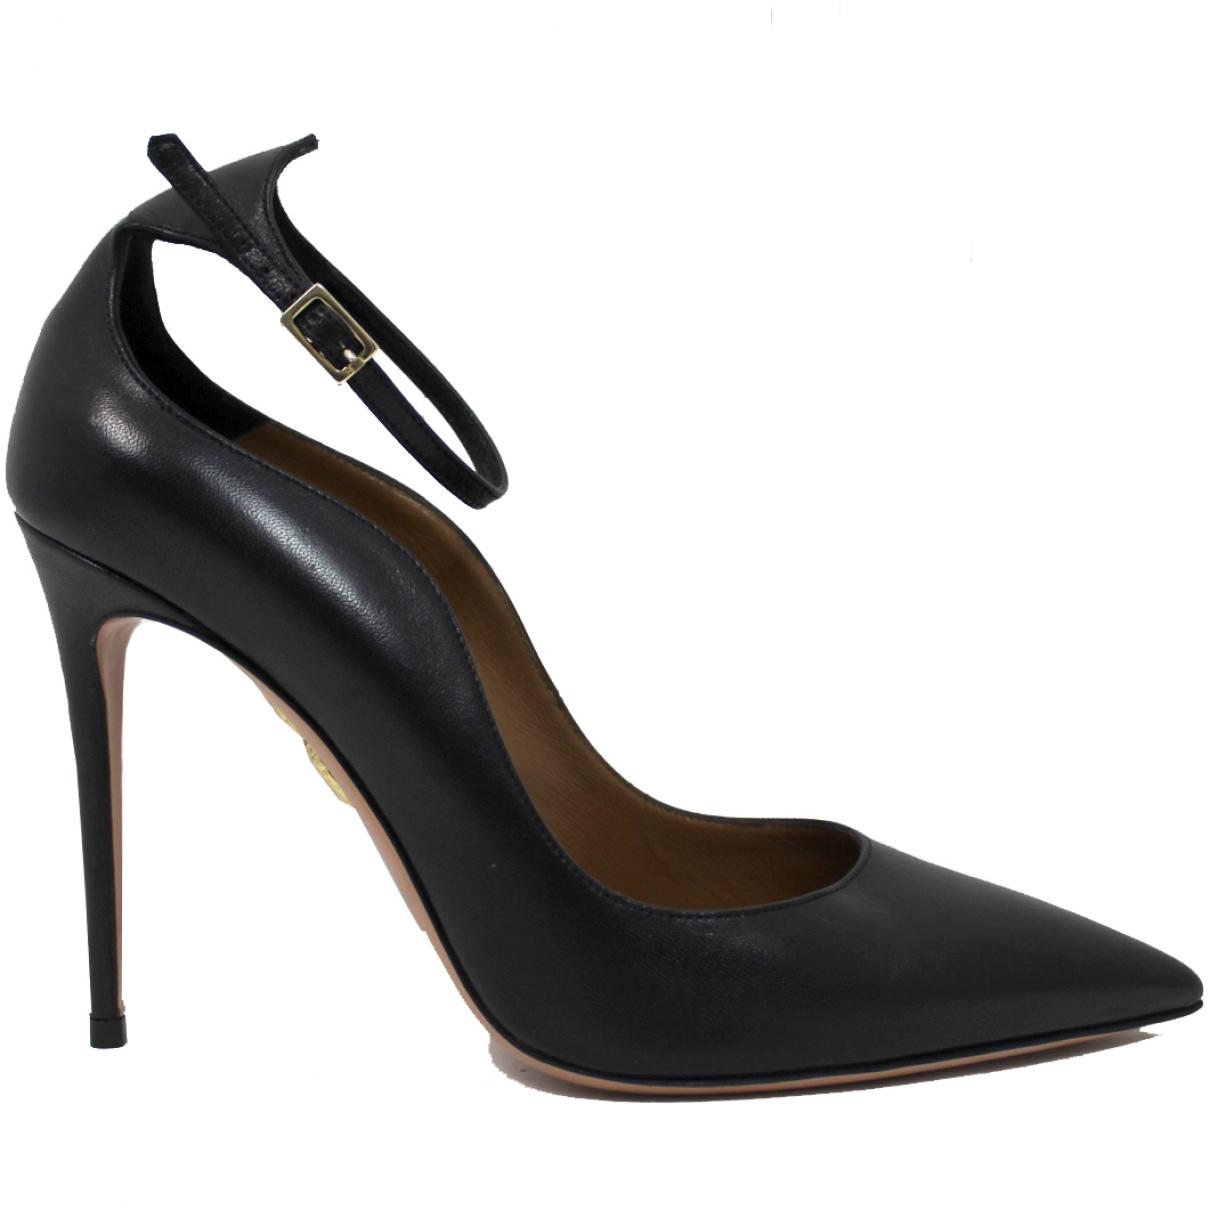 Aquazzura - Escarpins   pour femme en cuir - noir